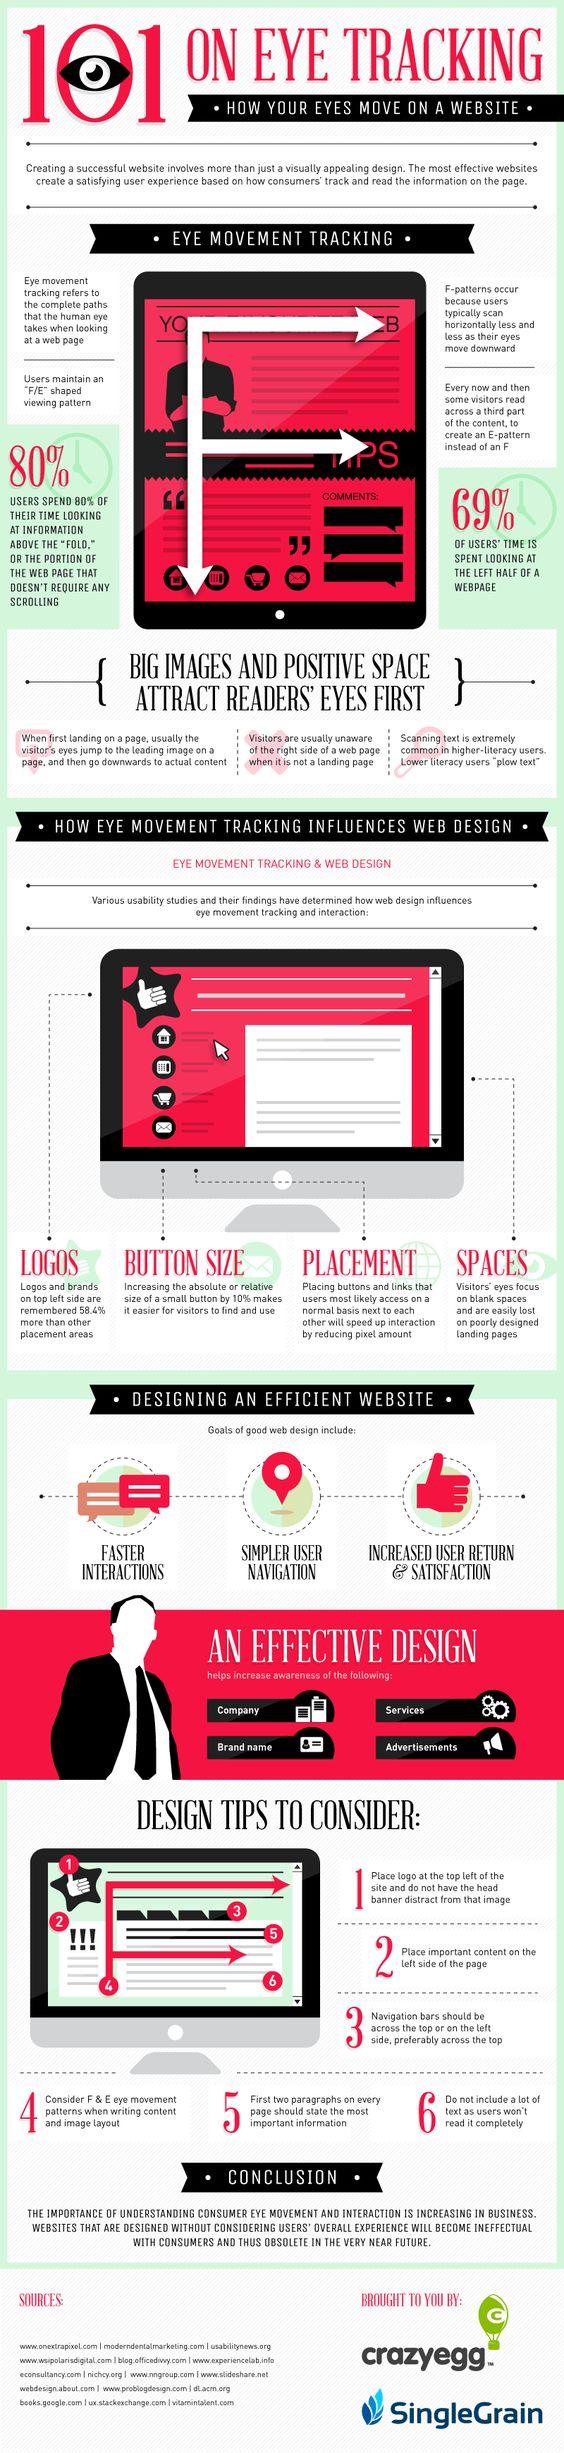 6 tips for designing an effective website design - #infographic #webdesign #business